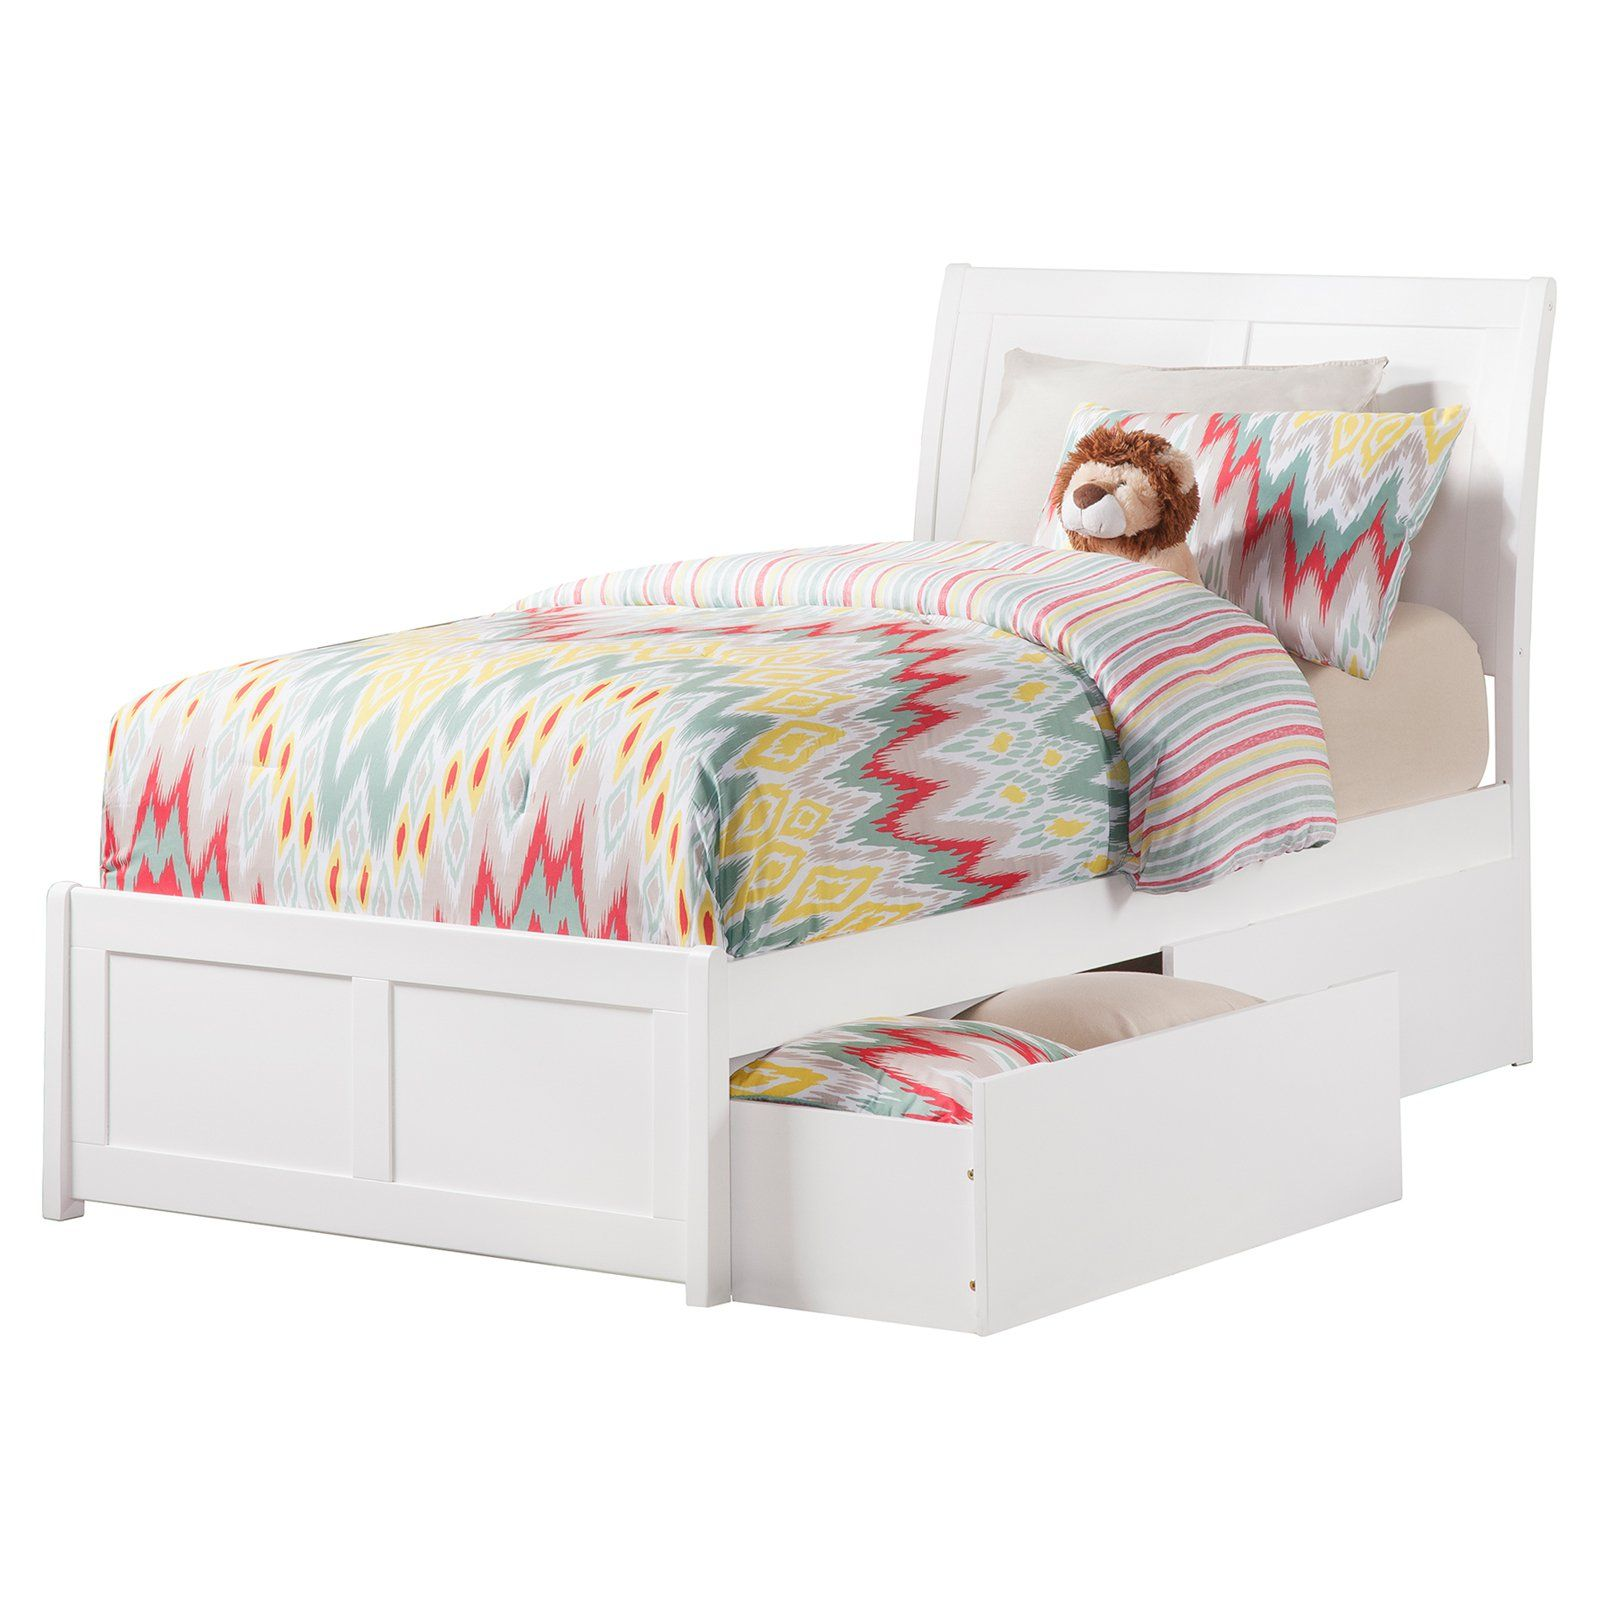 Atlantic Furniture Portland Platform Bed With Matching Foot Board